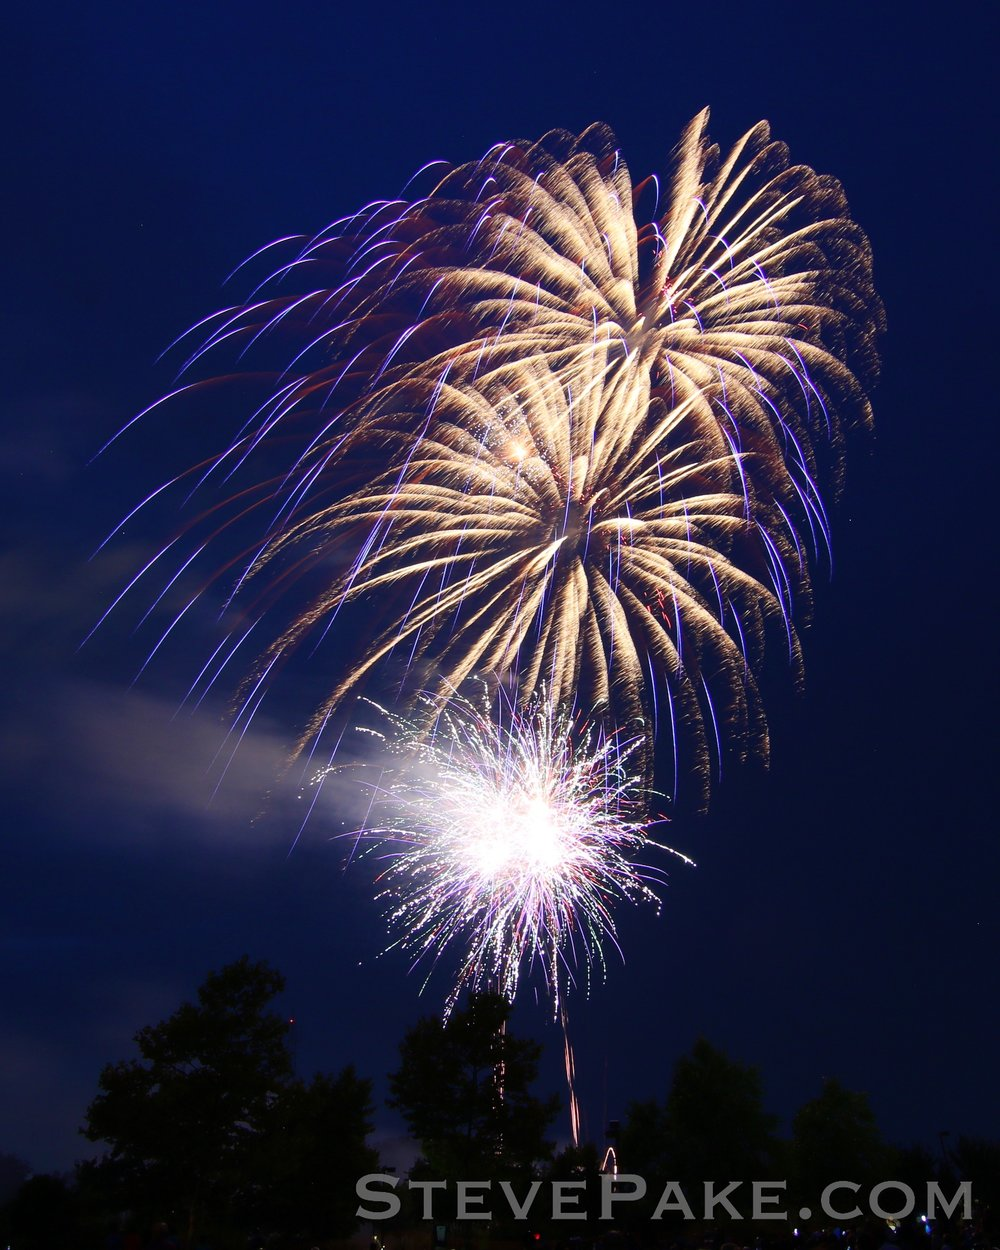 Fireworks2018_18_GE3A8524ap-HD-WM.jpg